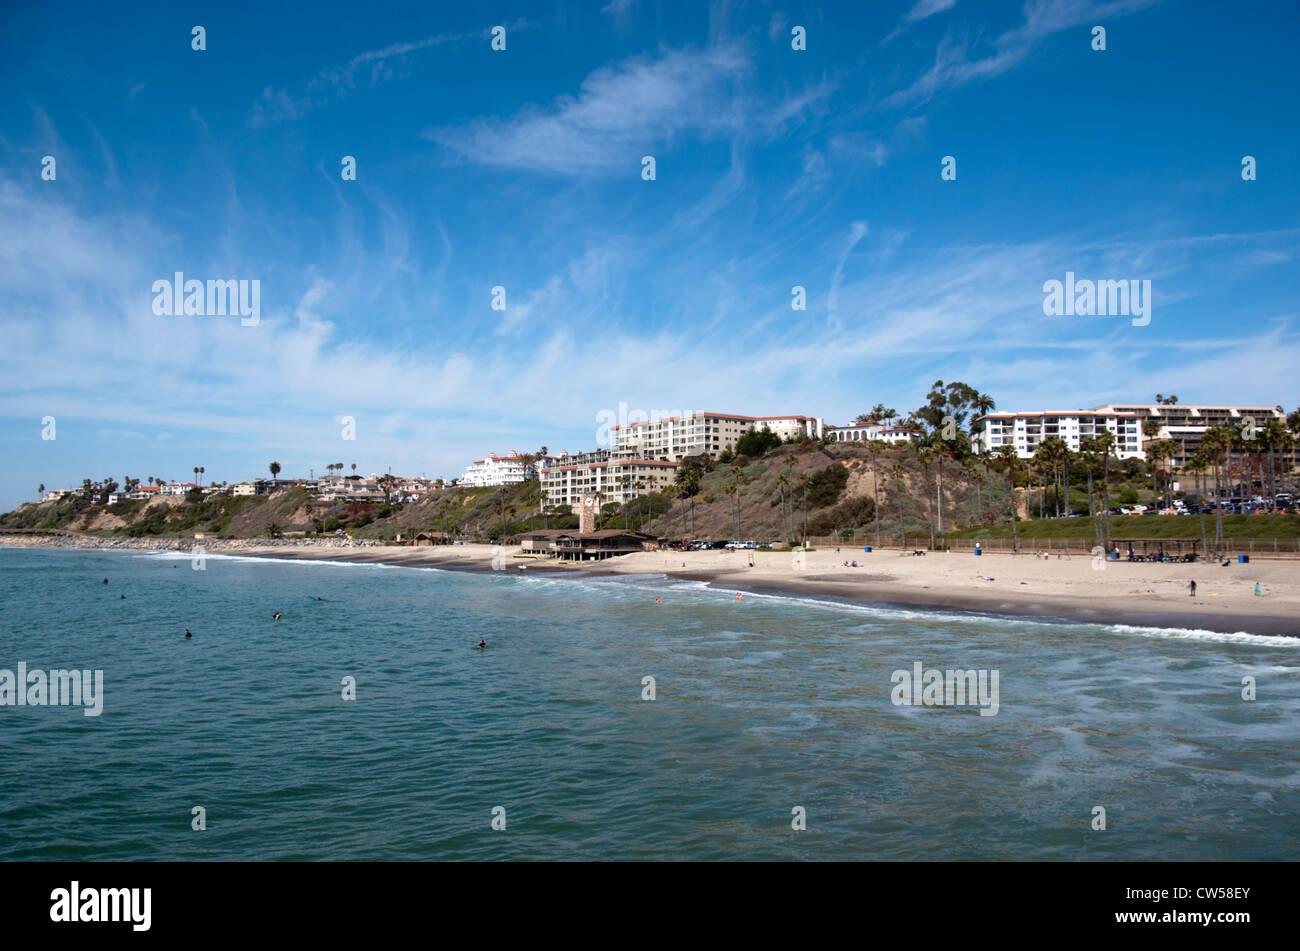 San Clemente, Southern California, USA (March 2012) Stock Photo